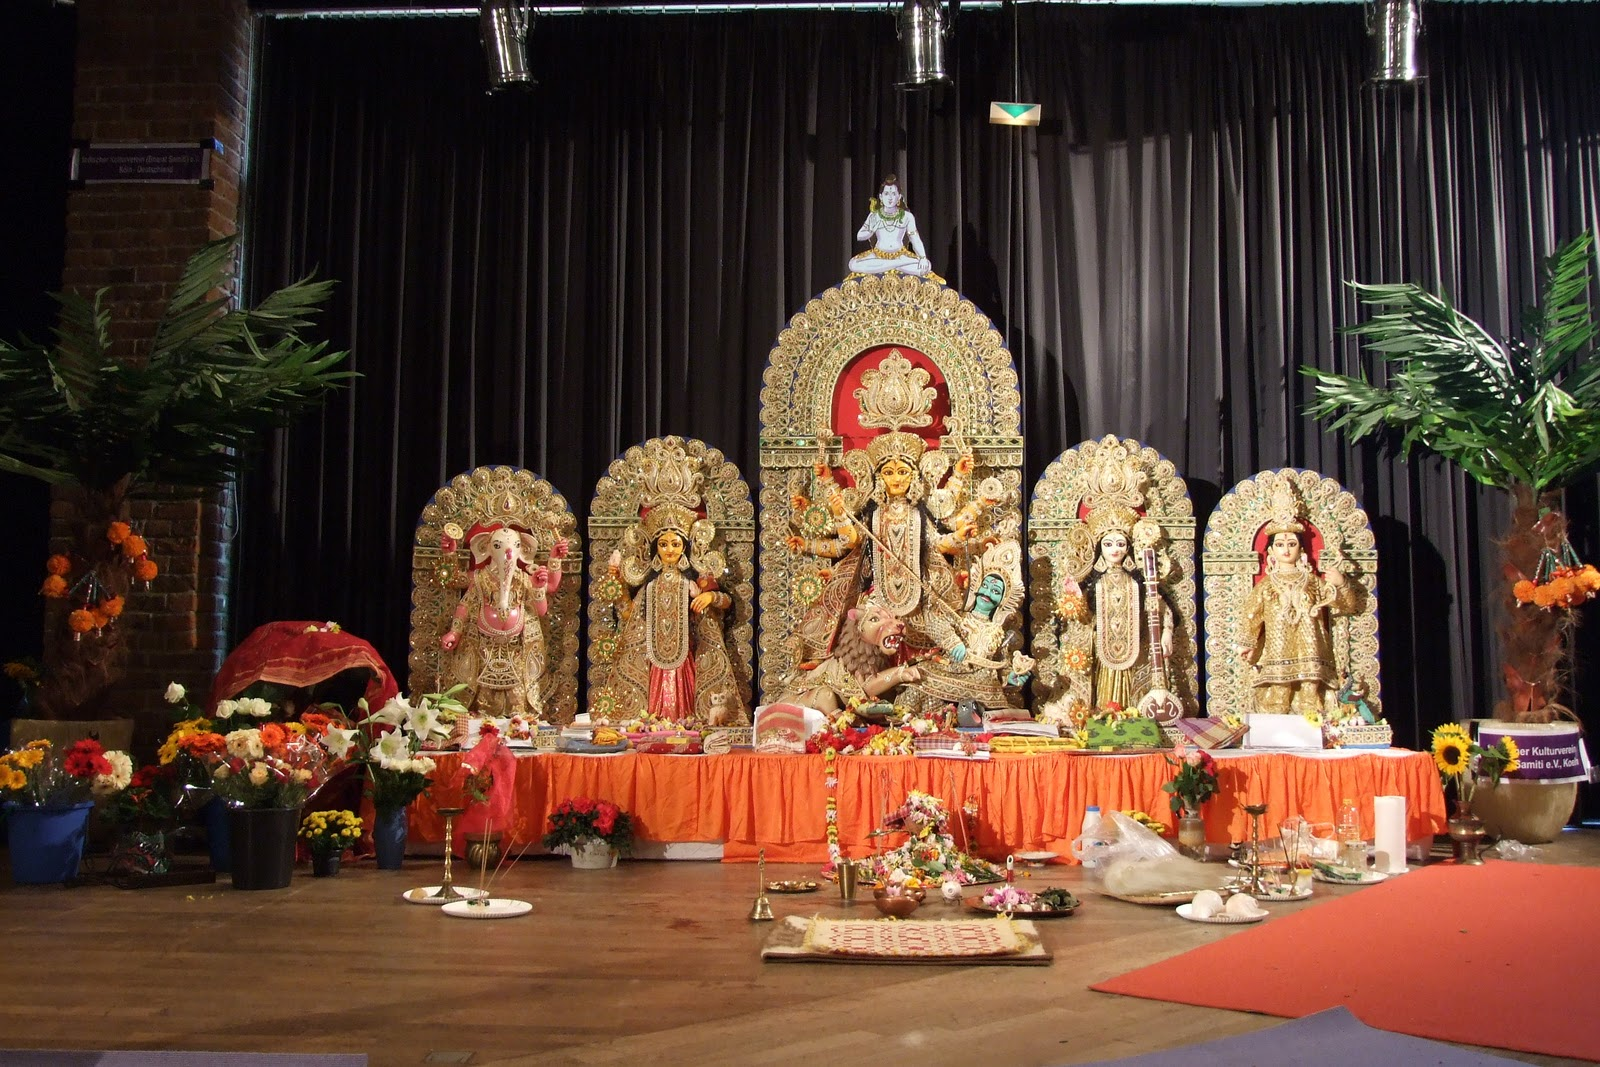 http://2.bp.blogspot.com/_Nuta_CQvImI/TM-7sEoRI1I/AAAAAAAADwE/wTEziiffR9U/s1600/Durga-puja-2009-1-Cologne-Germany-Ganesha-Lakshmi-Durga-Saraswati-Kartikeya.JPG